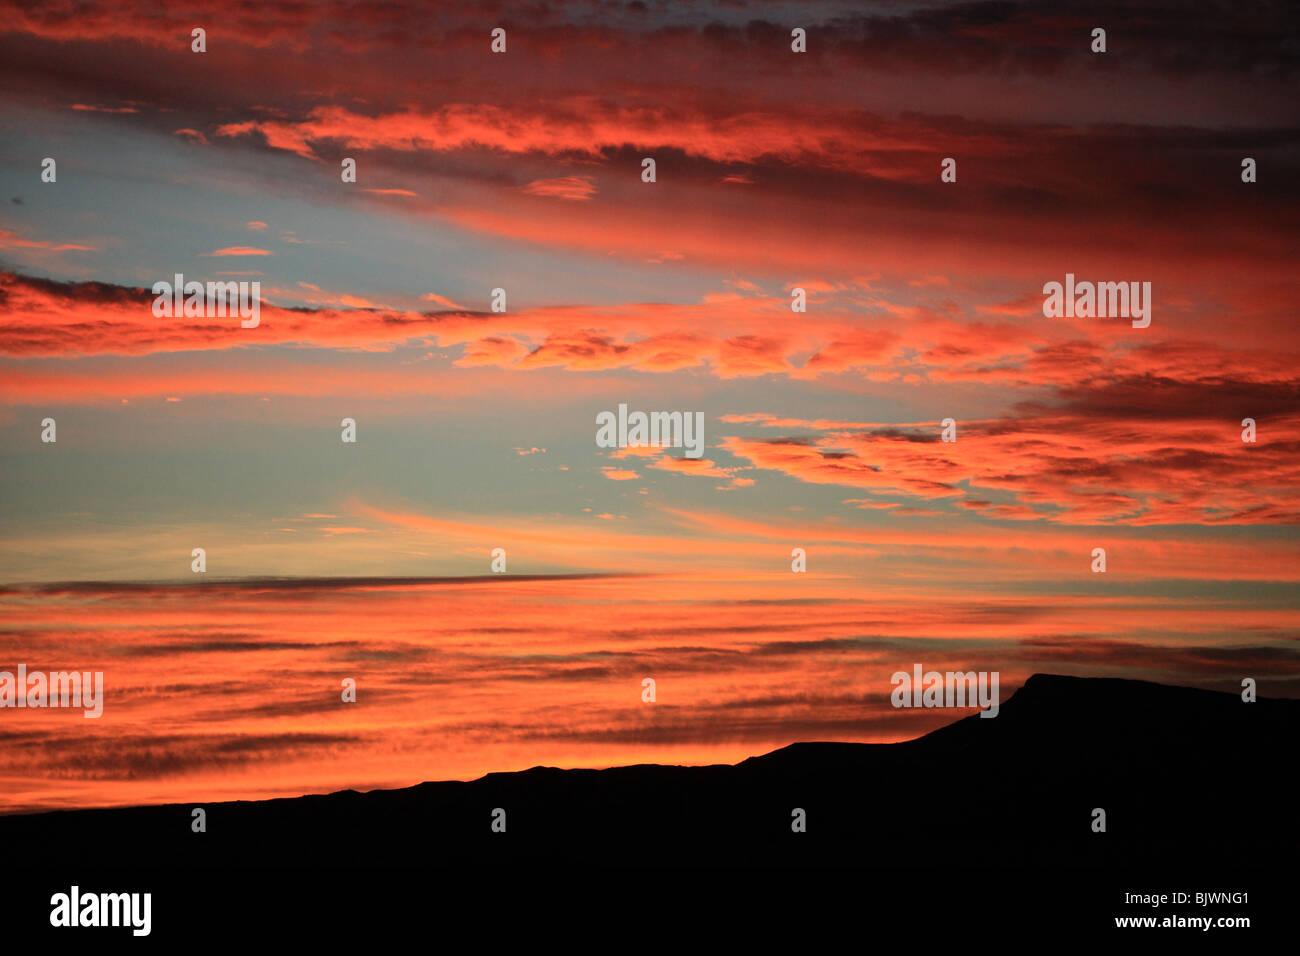 rotes leuchten am himmel